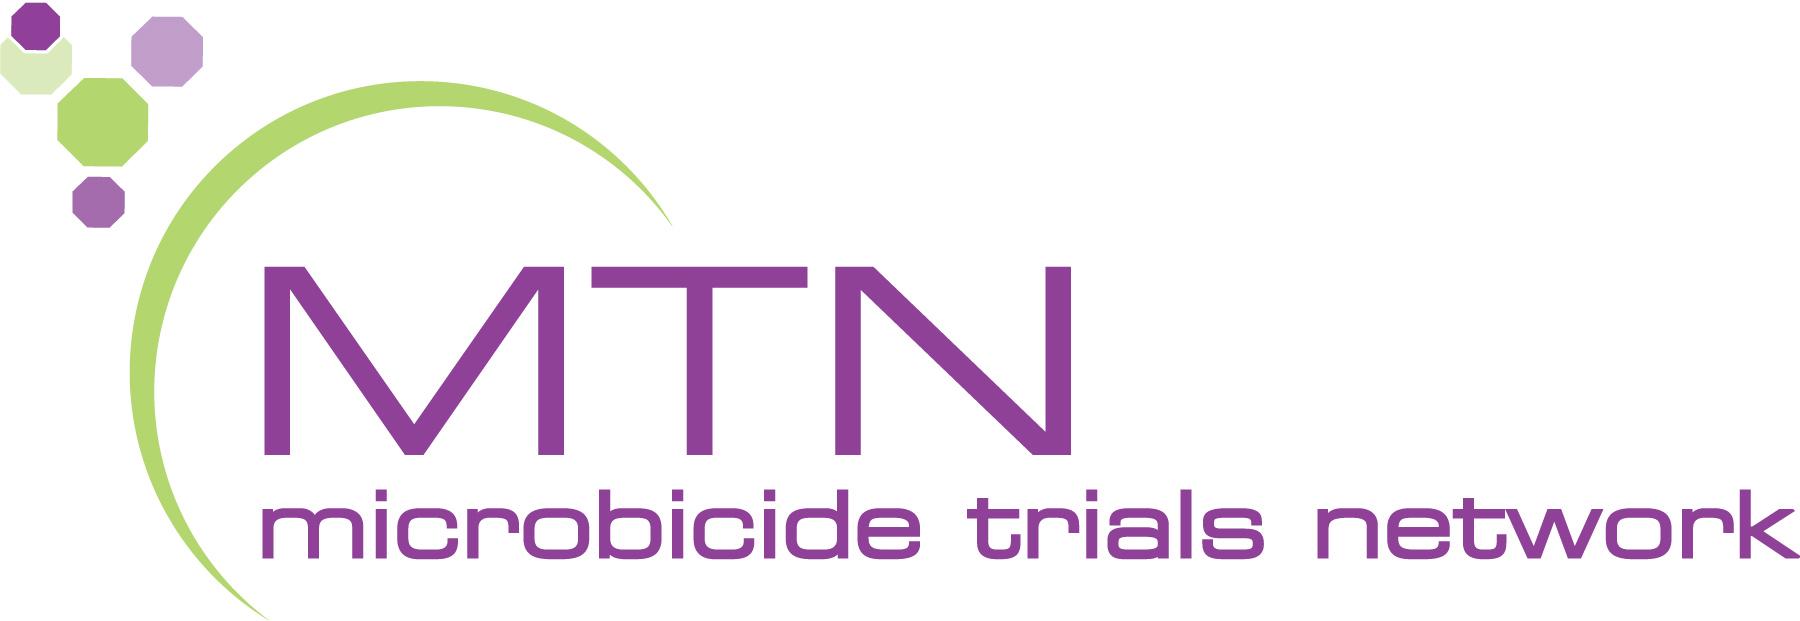 mtn logos microbicide trials network